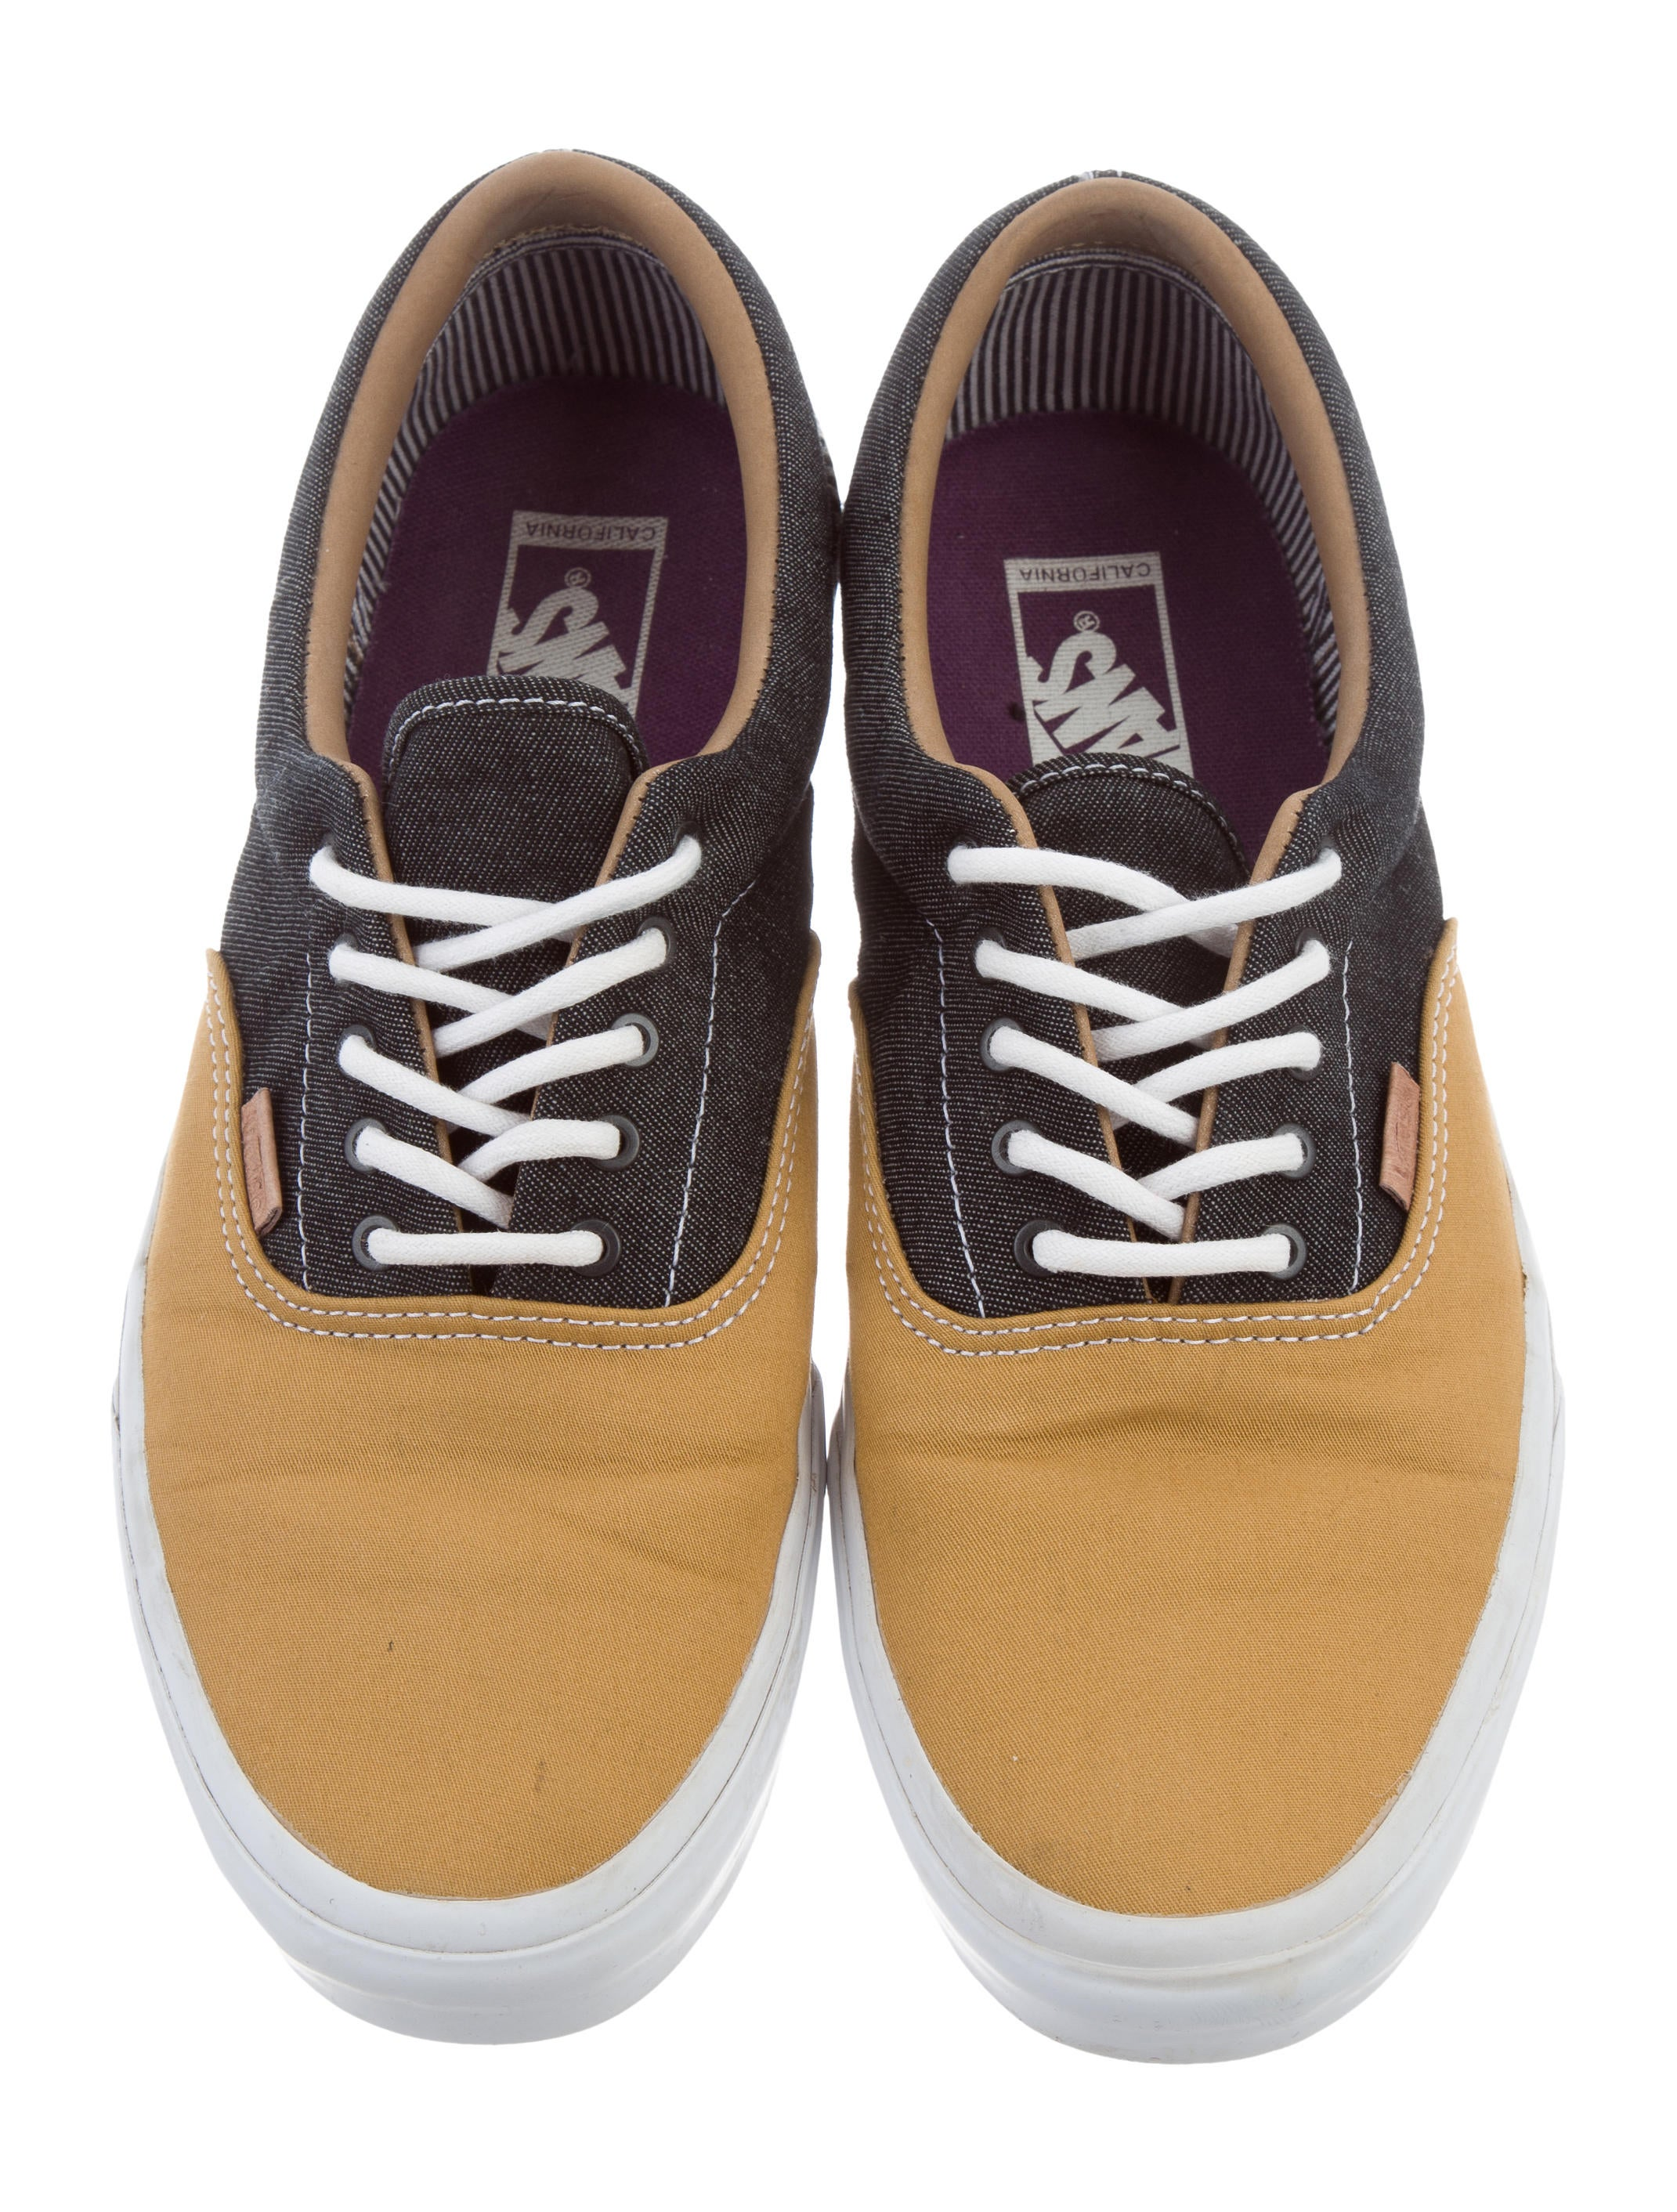 vans denim canvas low top sneakers shoes wvans20047. Black Bedroom Furniture Sets. Home Design Ideas